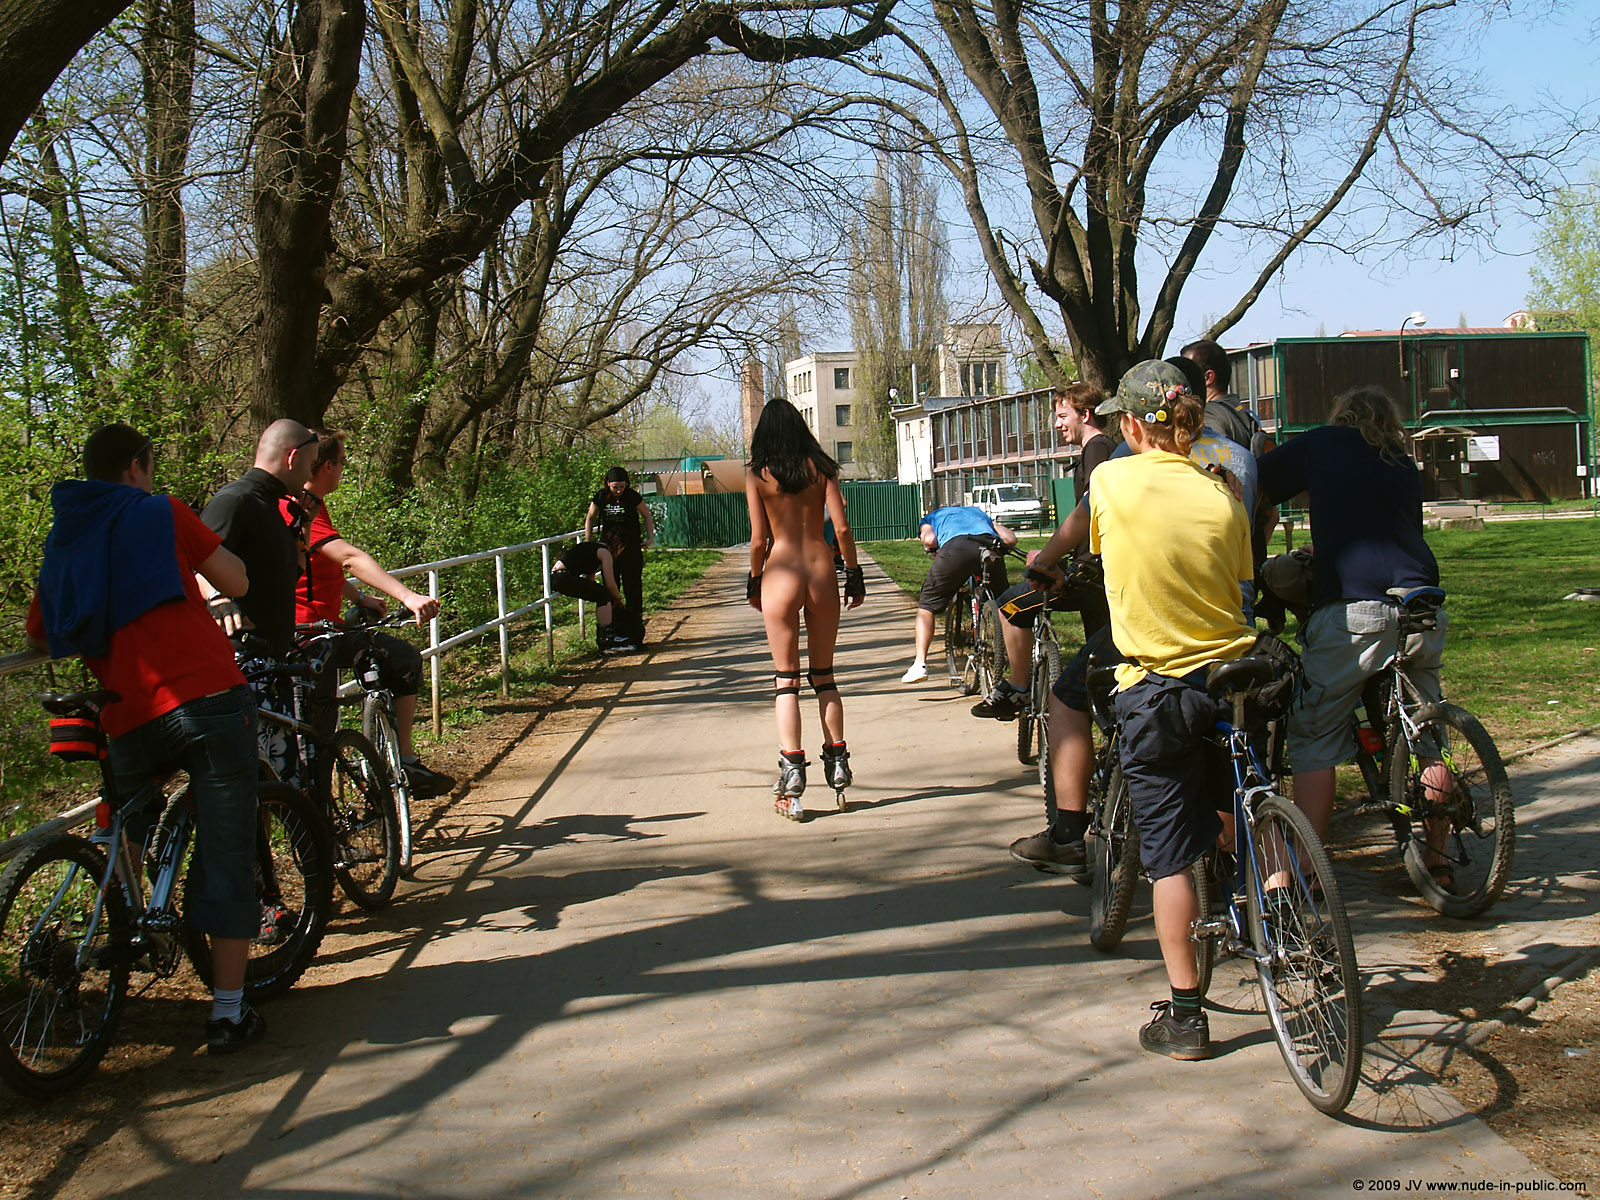 gwen-roller-skates-nude-in-public-15